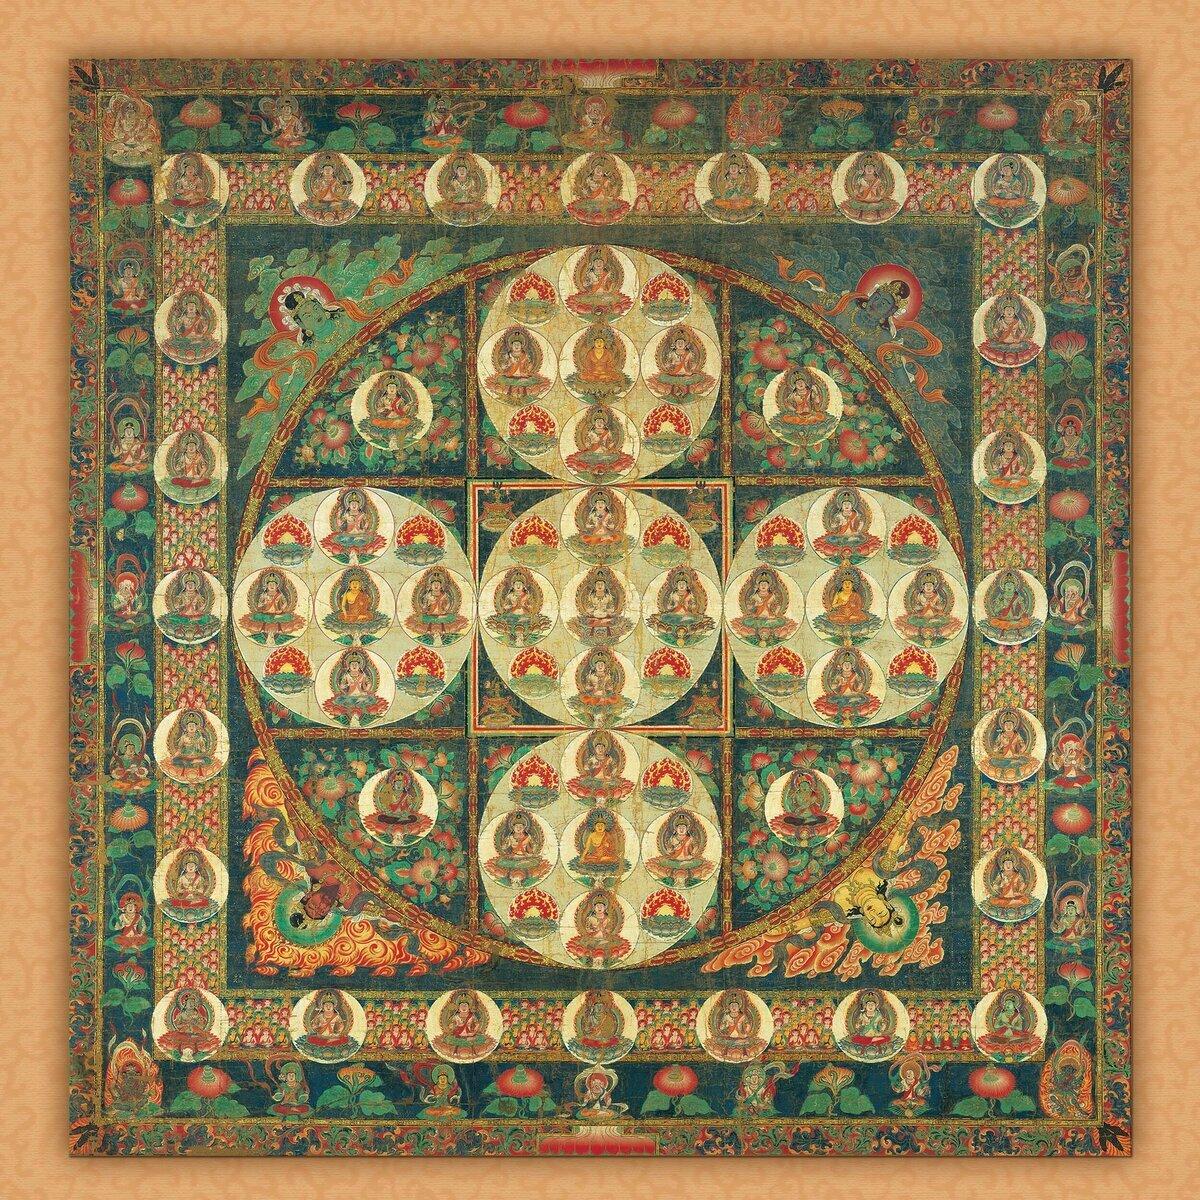 Calendrier 2021 Bouddha Mandala